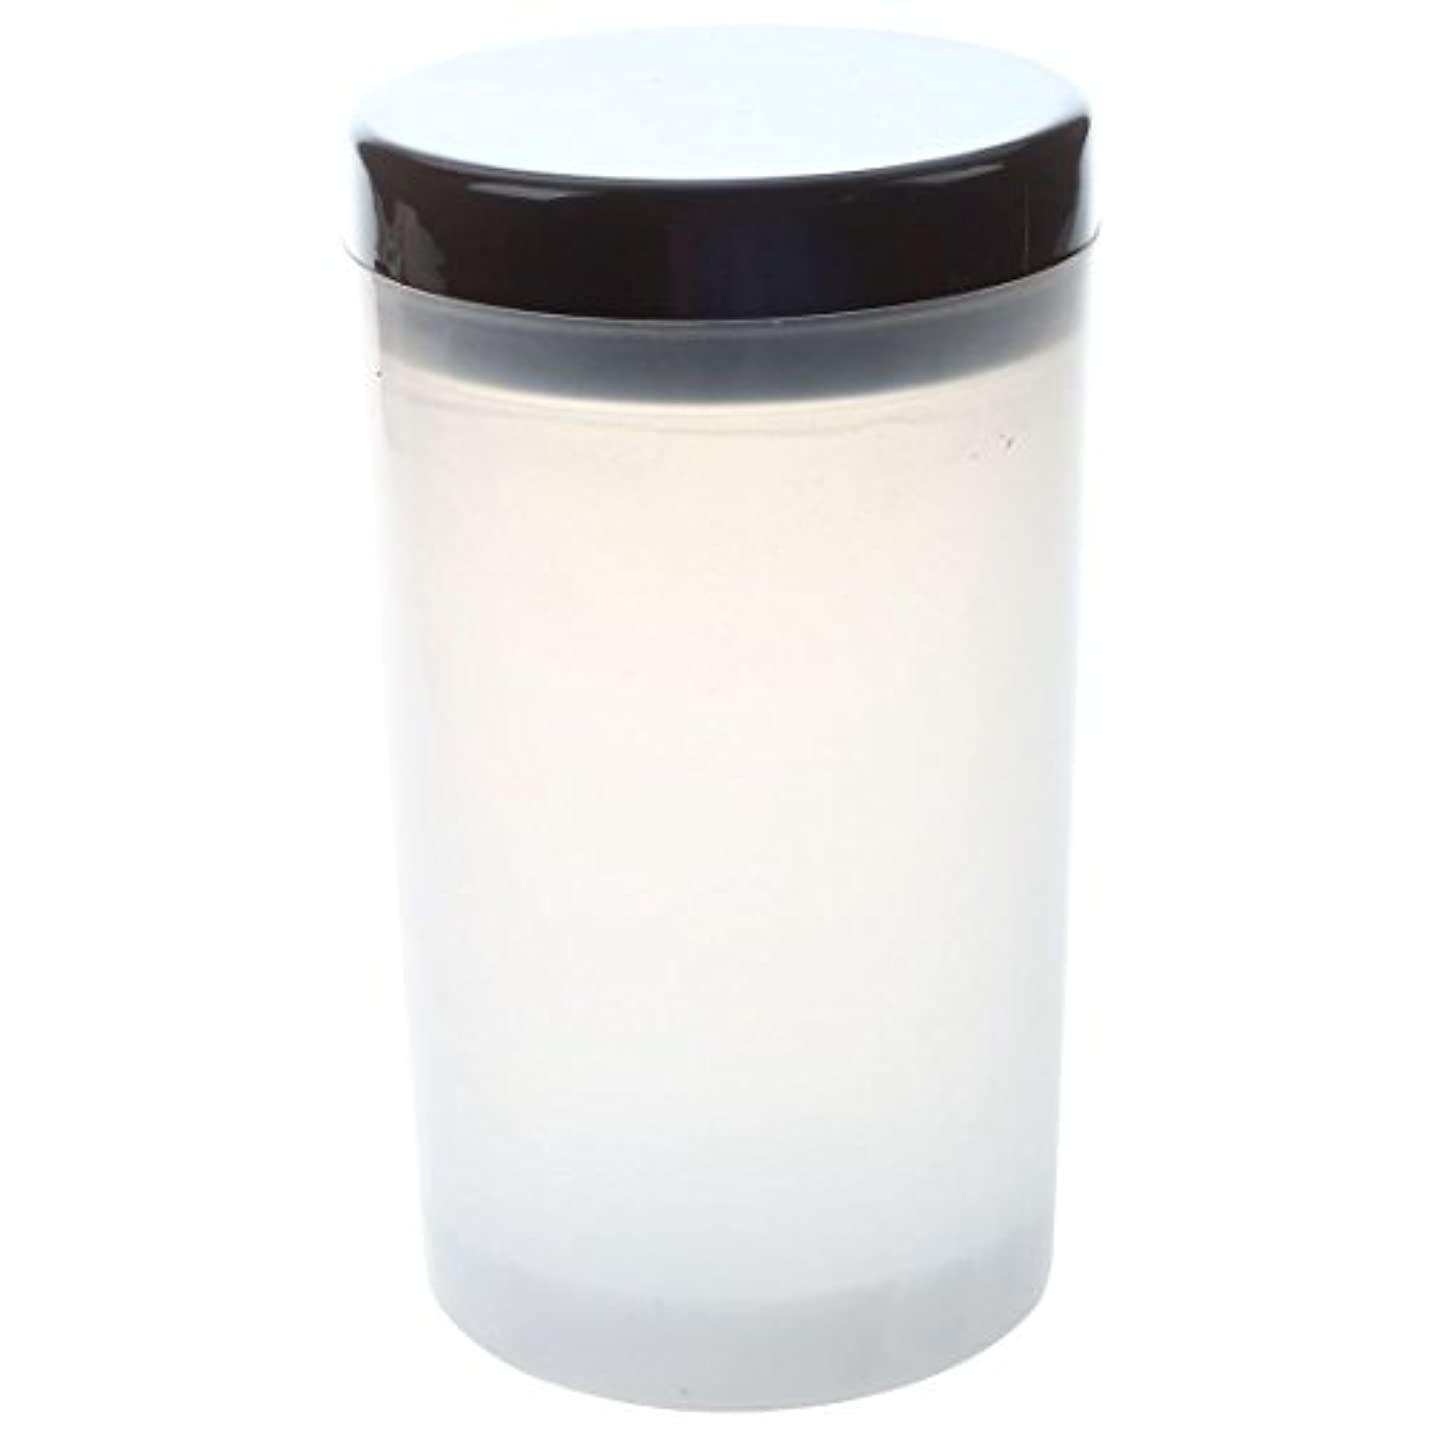 Xigeapg ネイルアートチップブラシホルダー リムーバーカップカップ浸漬ブラシ クリーナーボトル